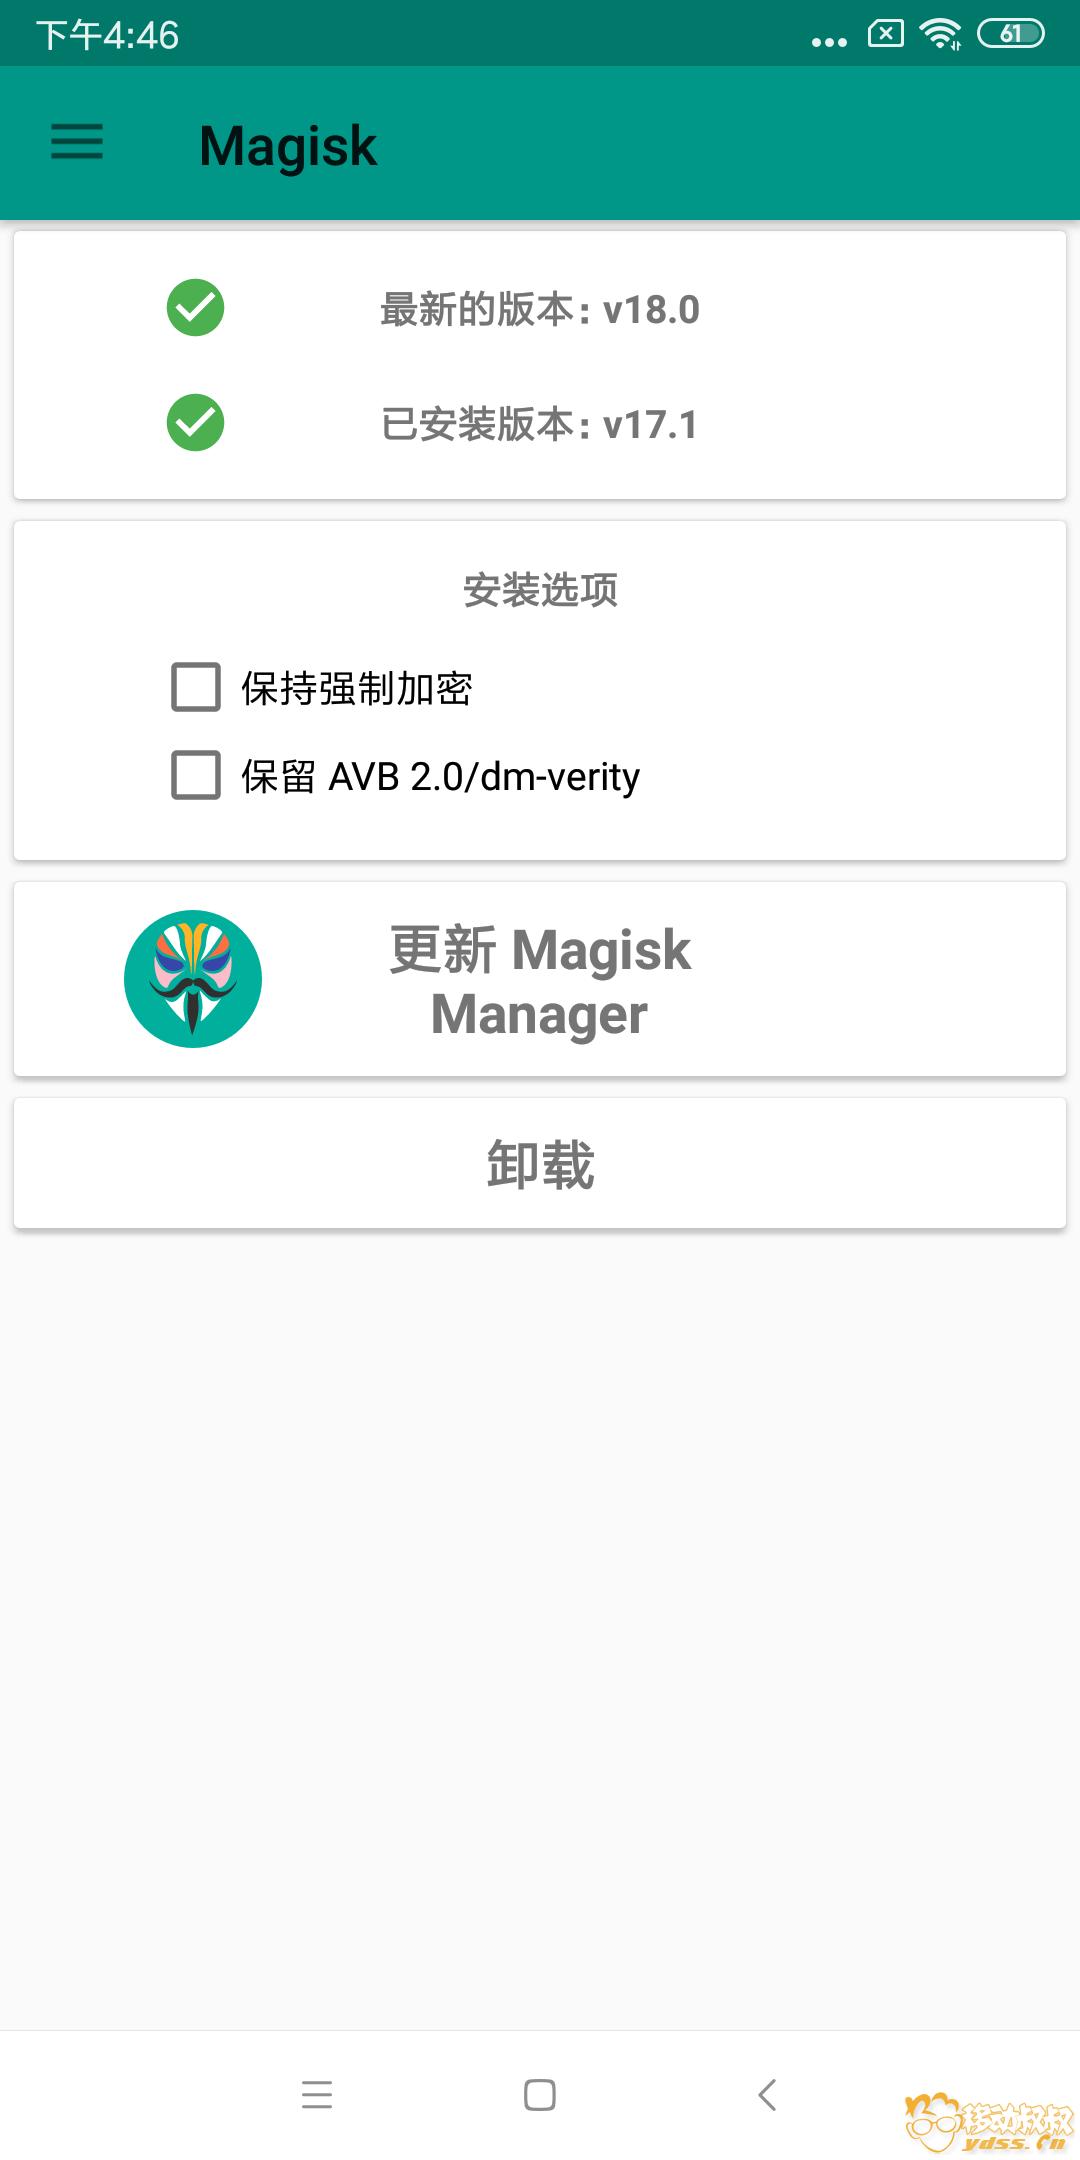 Screenshot_2019-01-10-16-46-34-351_com.topjohnwu.magisk.png